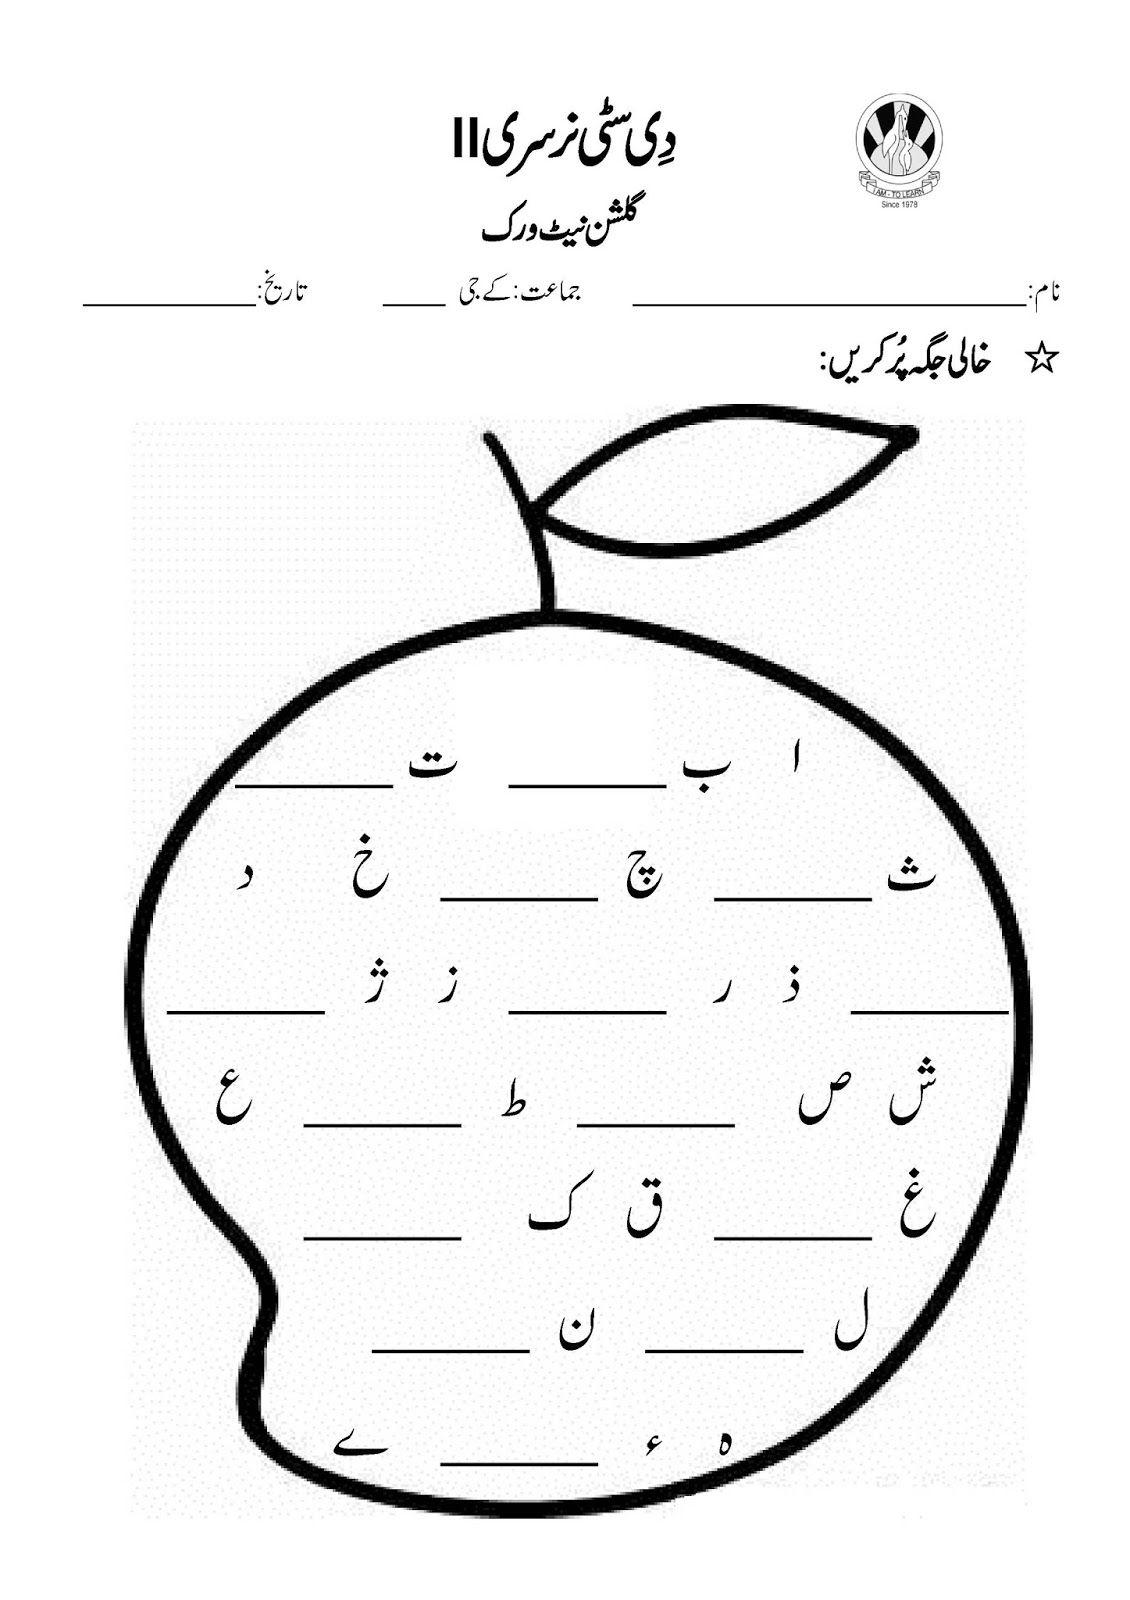 Sr Gulshan The City Nursery-Ii: Urdu First Term